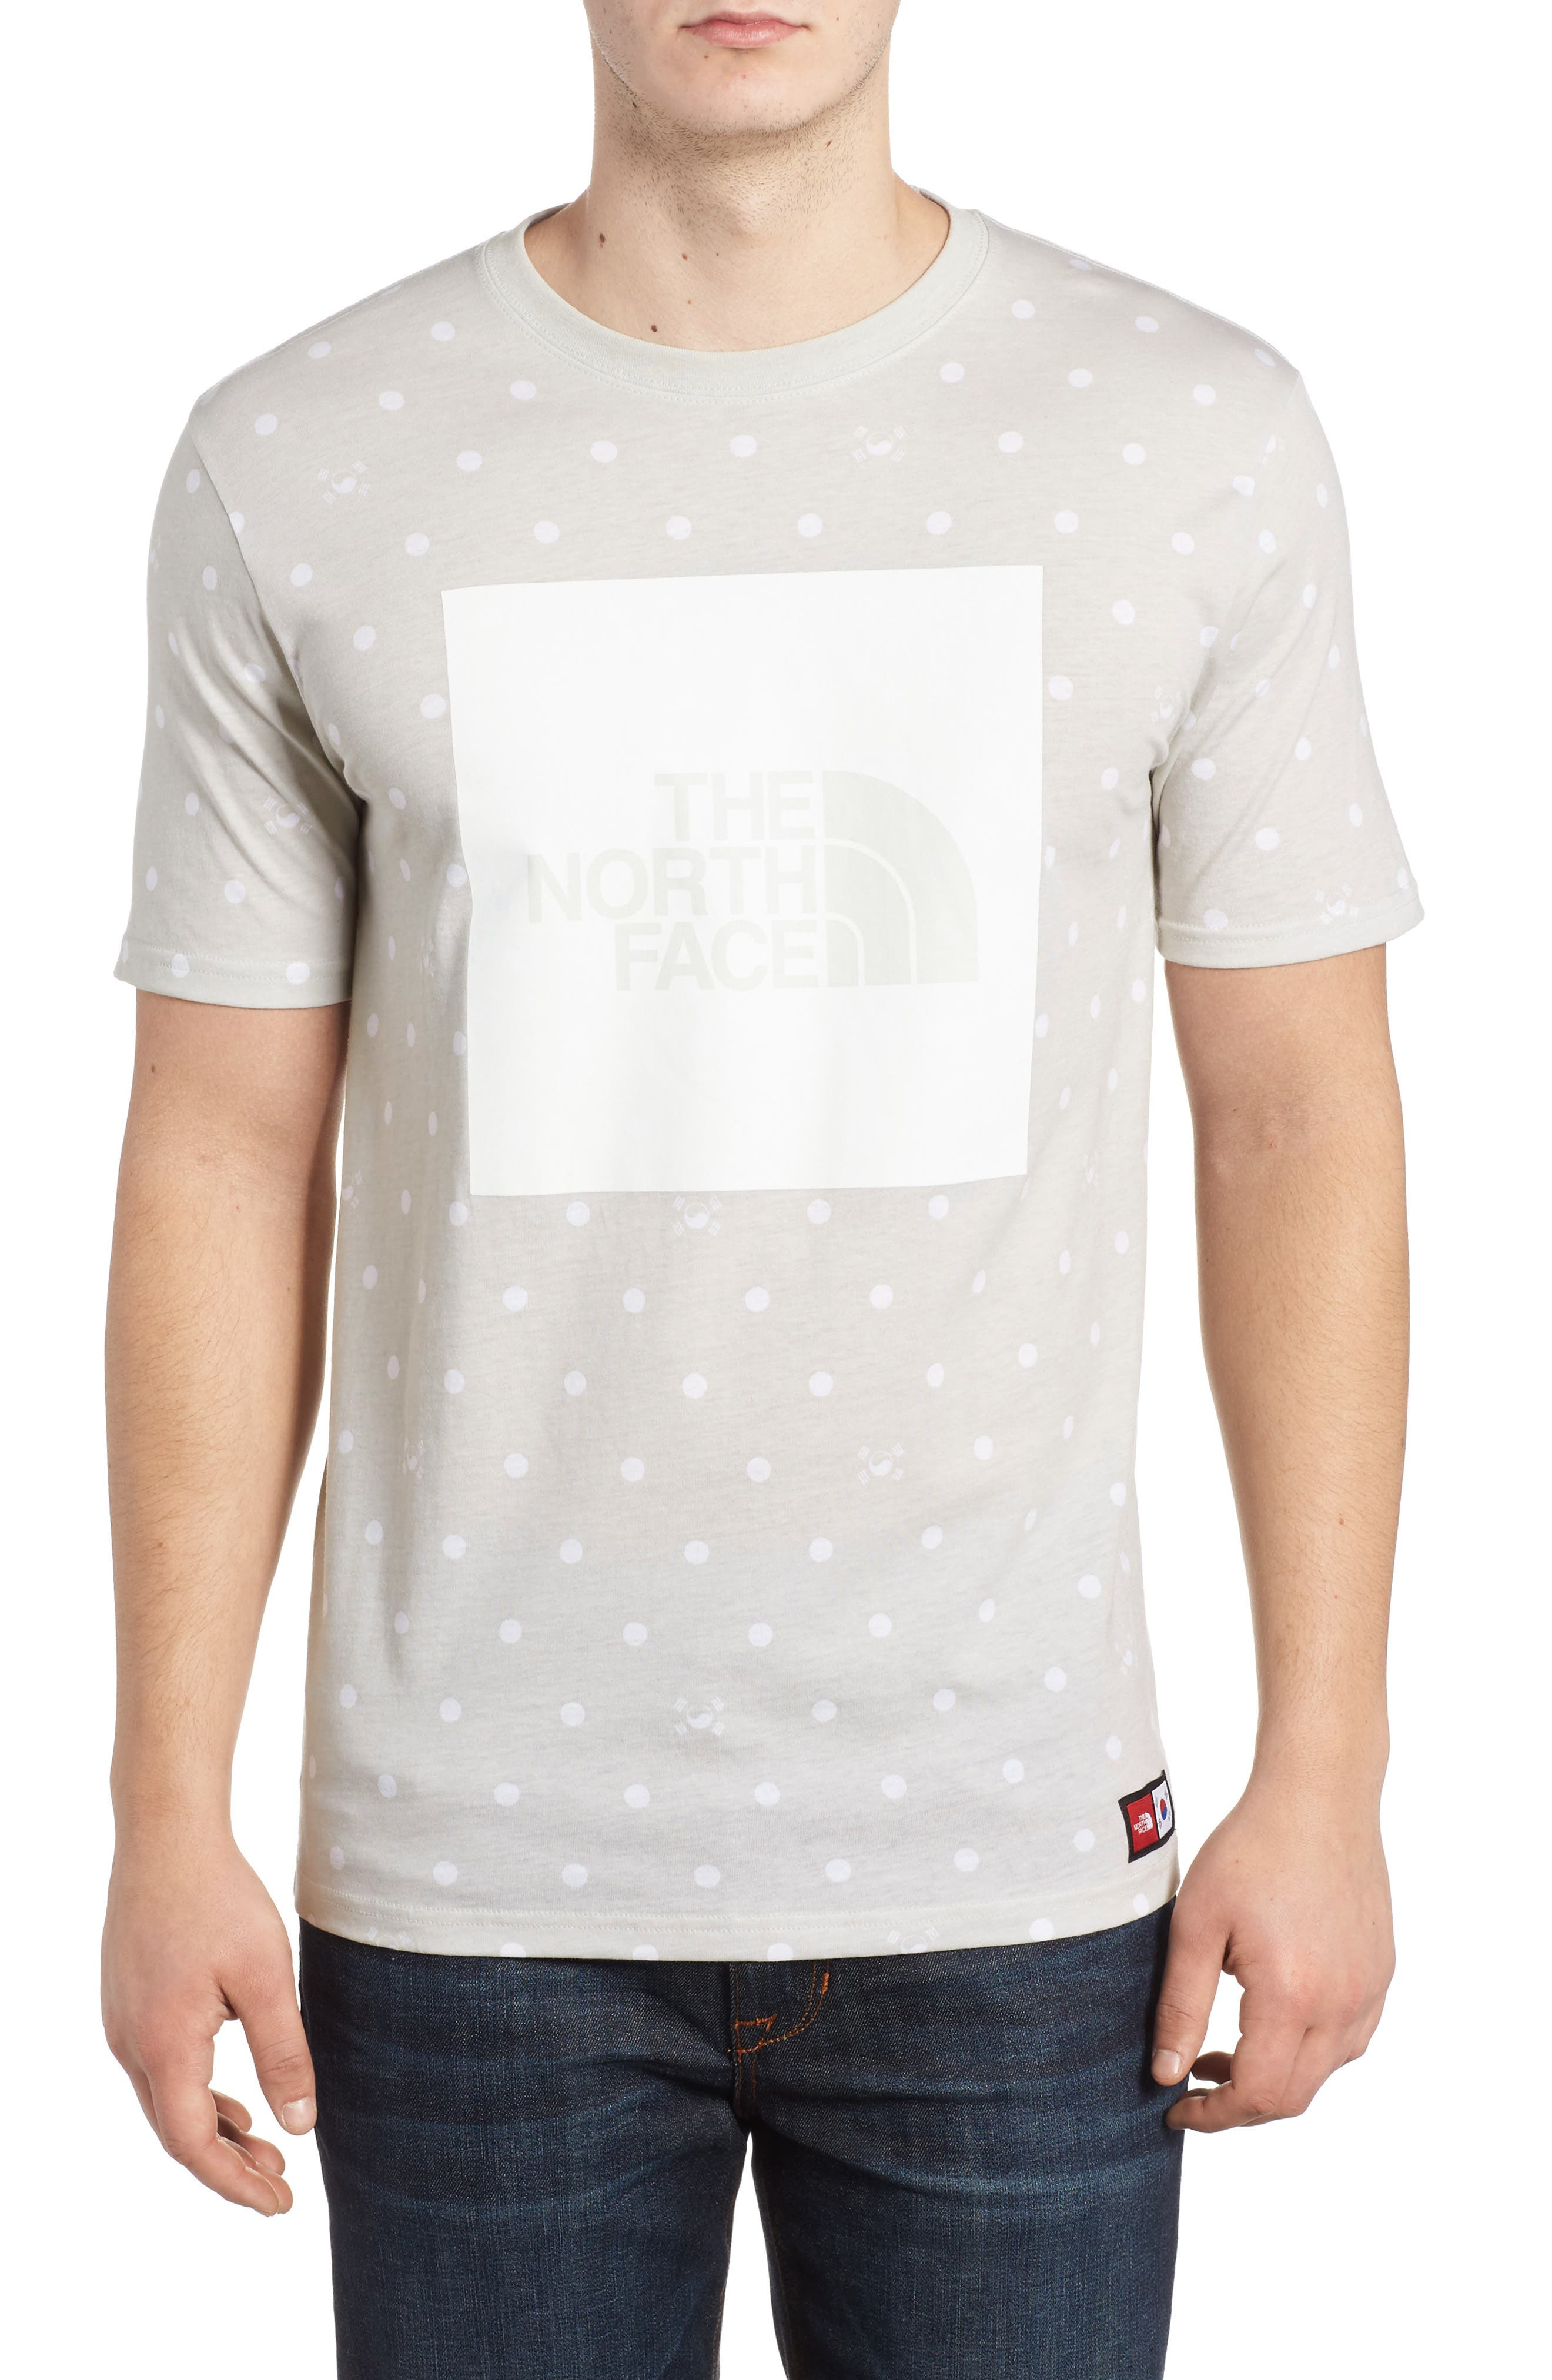 International Collection Star Print T-Shirt,                             Main thumbnail 1, color,                             030